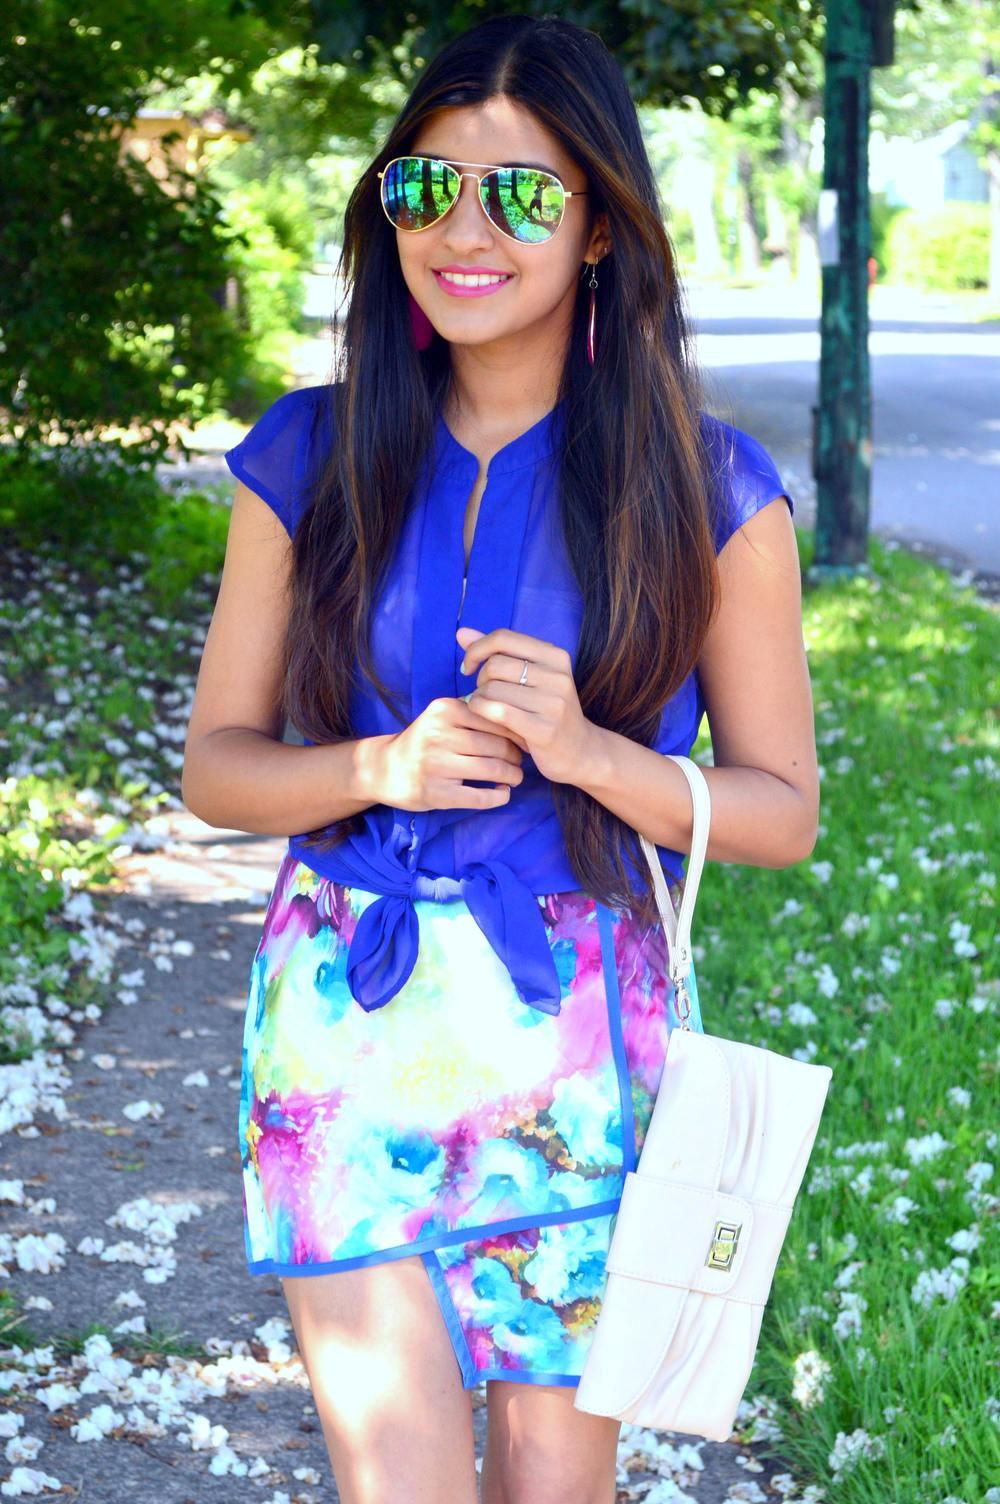 Floral Skirt 2